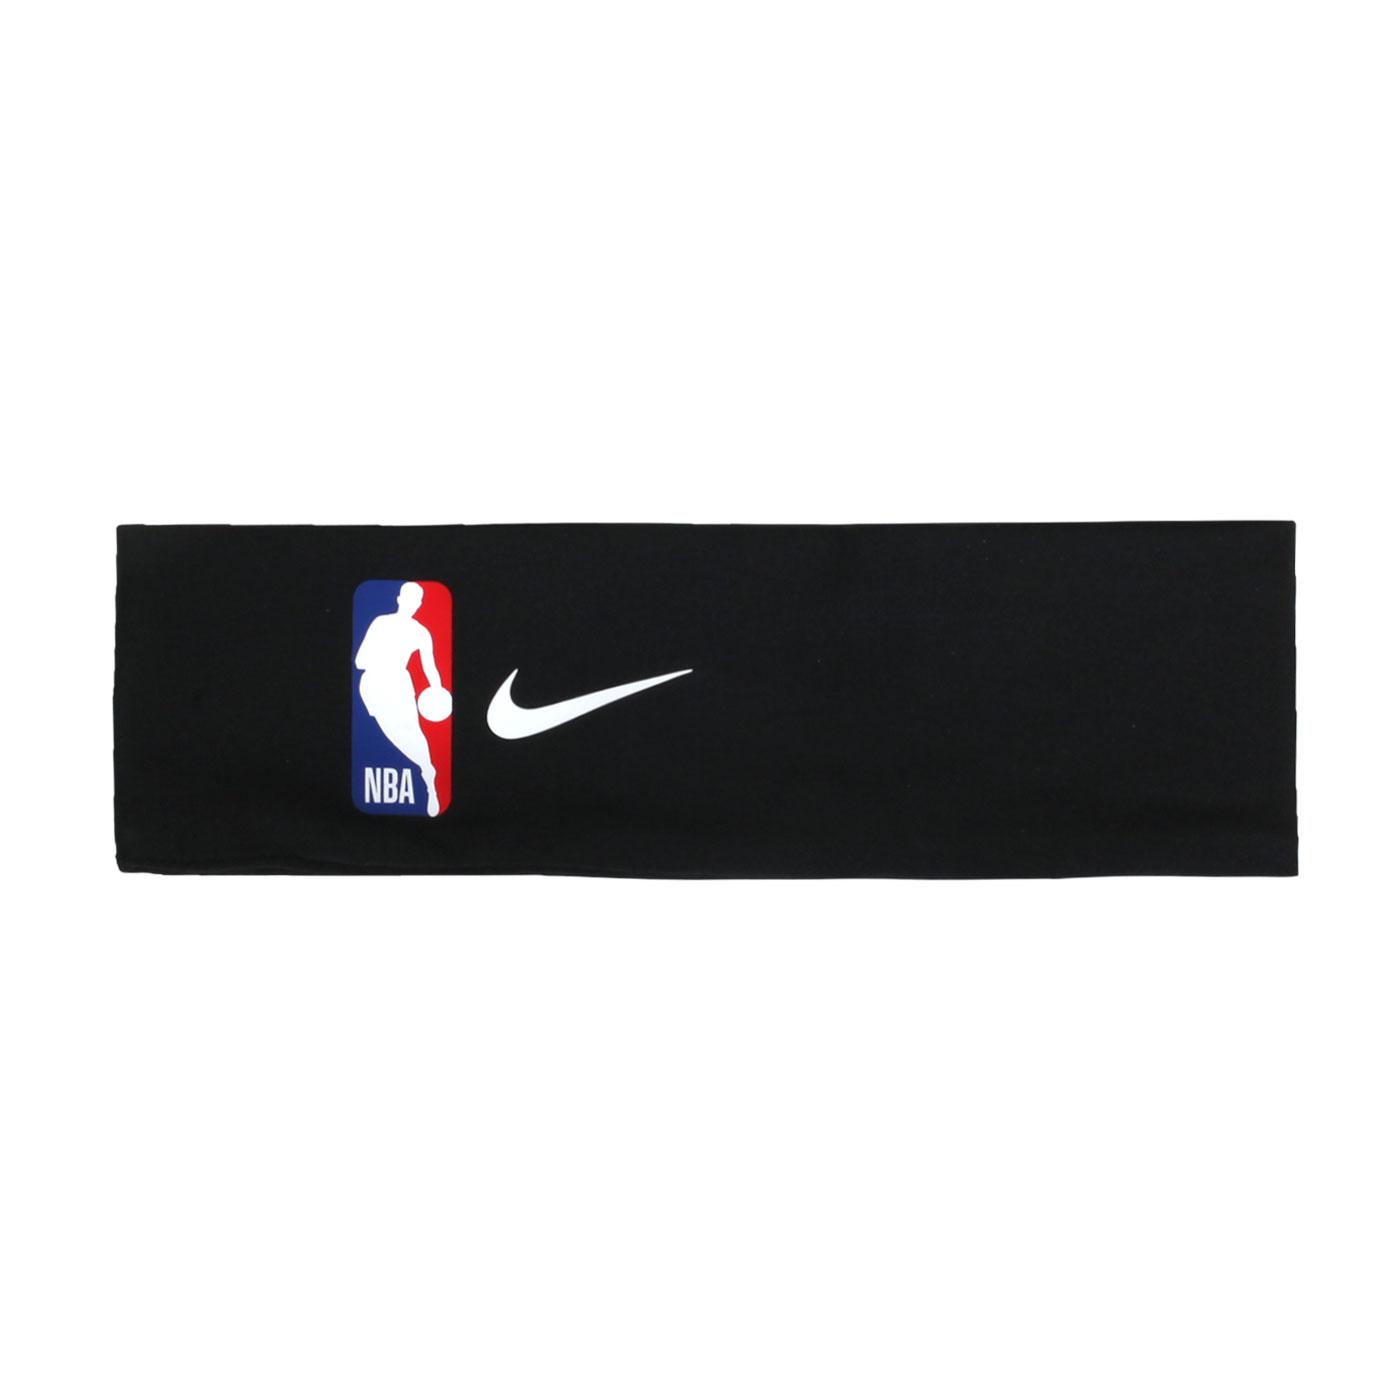 NIKE  FURY HEADBAND 2.0 NBA 頭帶N1003647010OS - 黑白紅藍